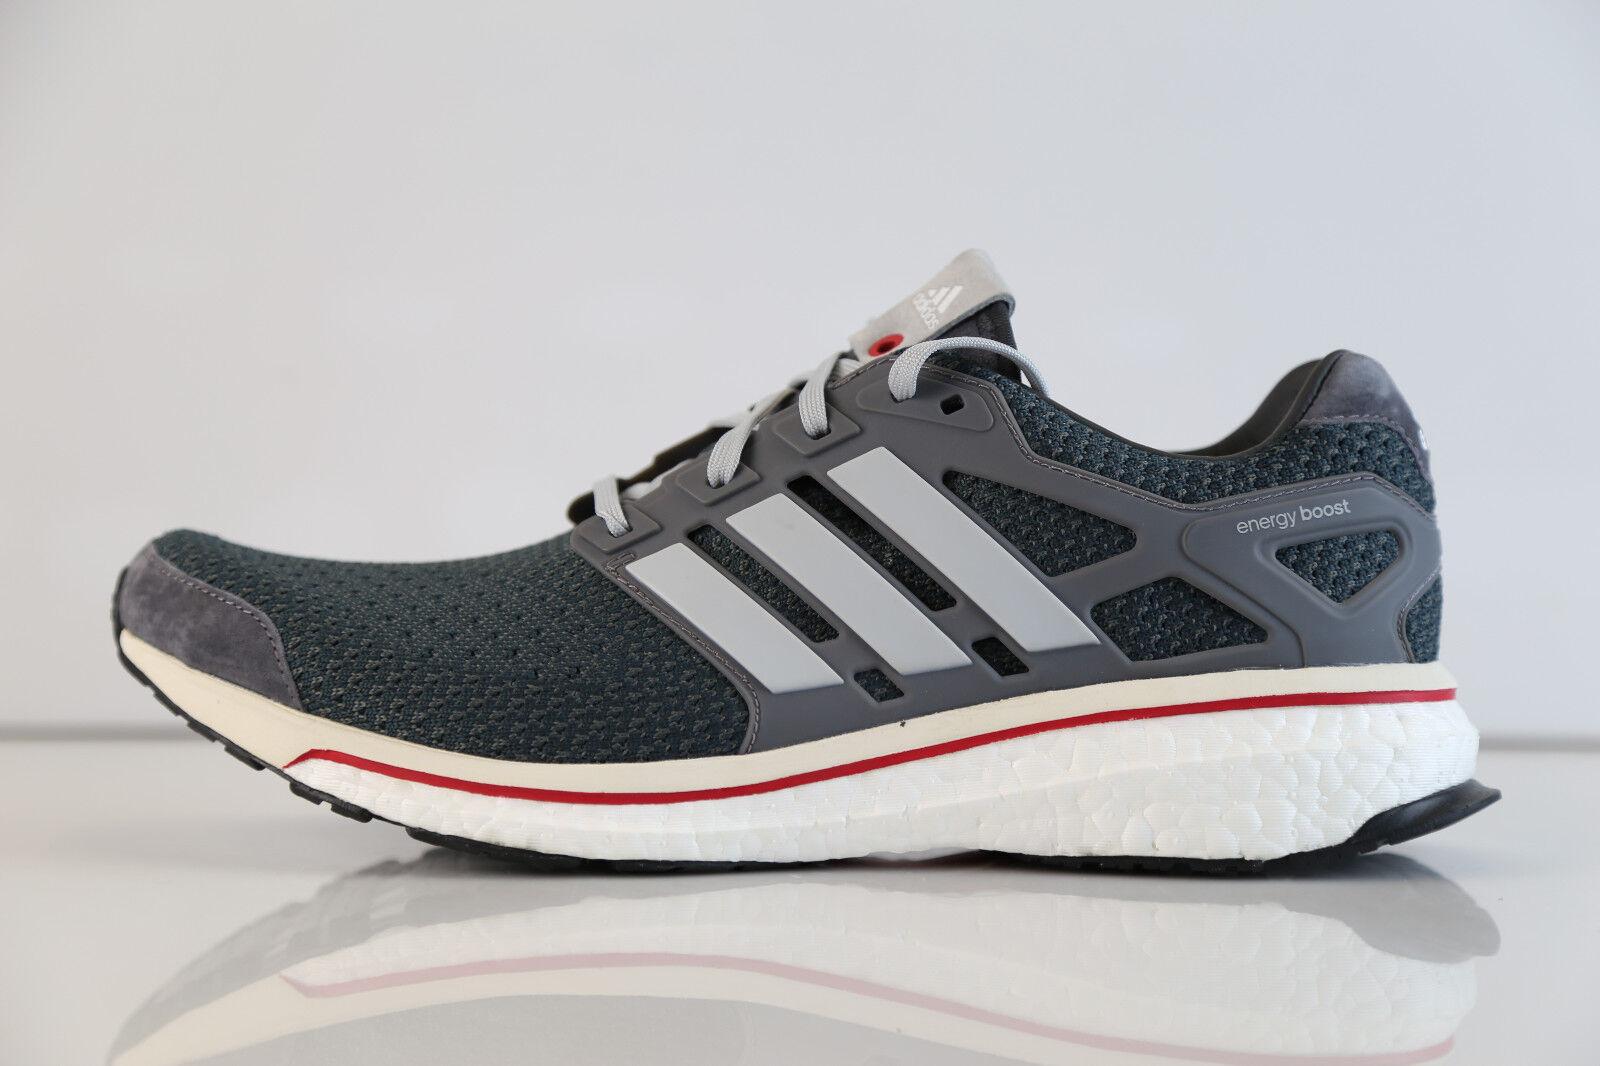 Adidas Consortium Energy Boost Run Thru Time Grey S81135 8.5 11.5 pk ultra